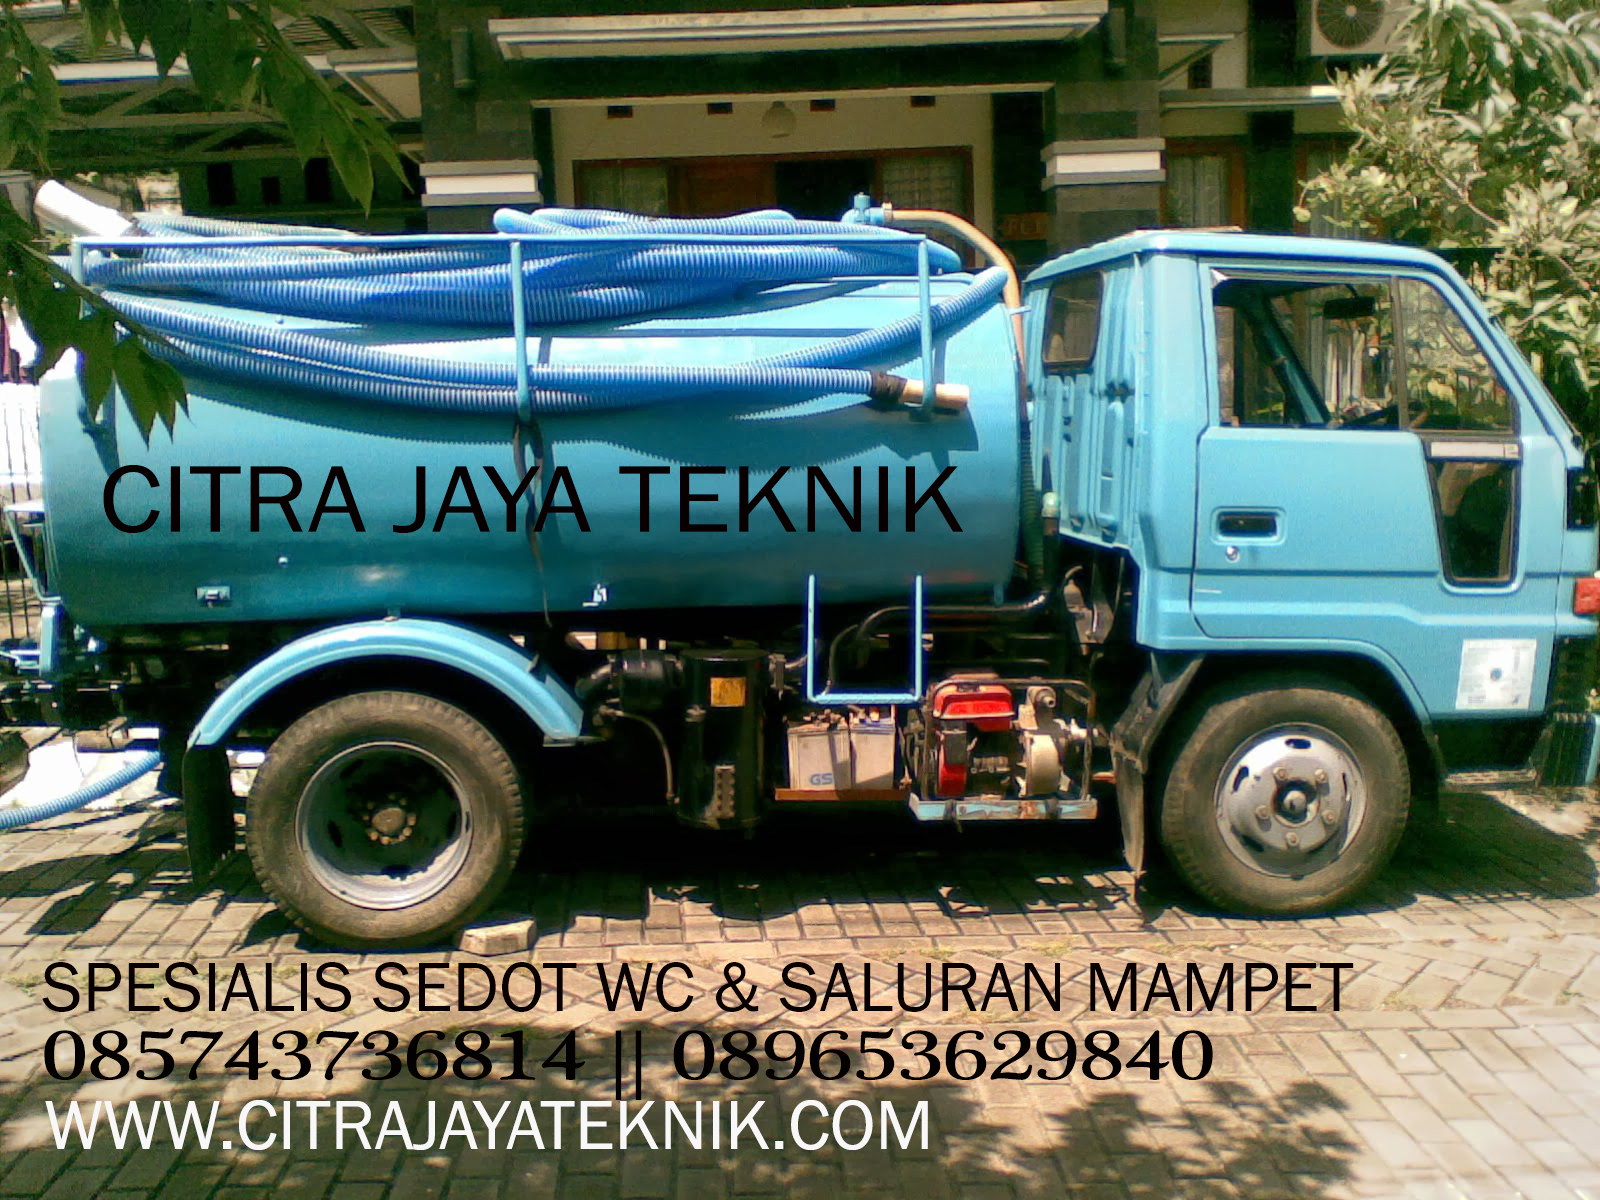 Jasa Sedot WC Area Yogyakarta